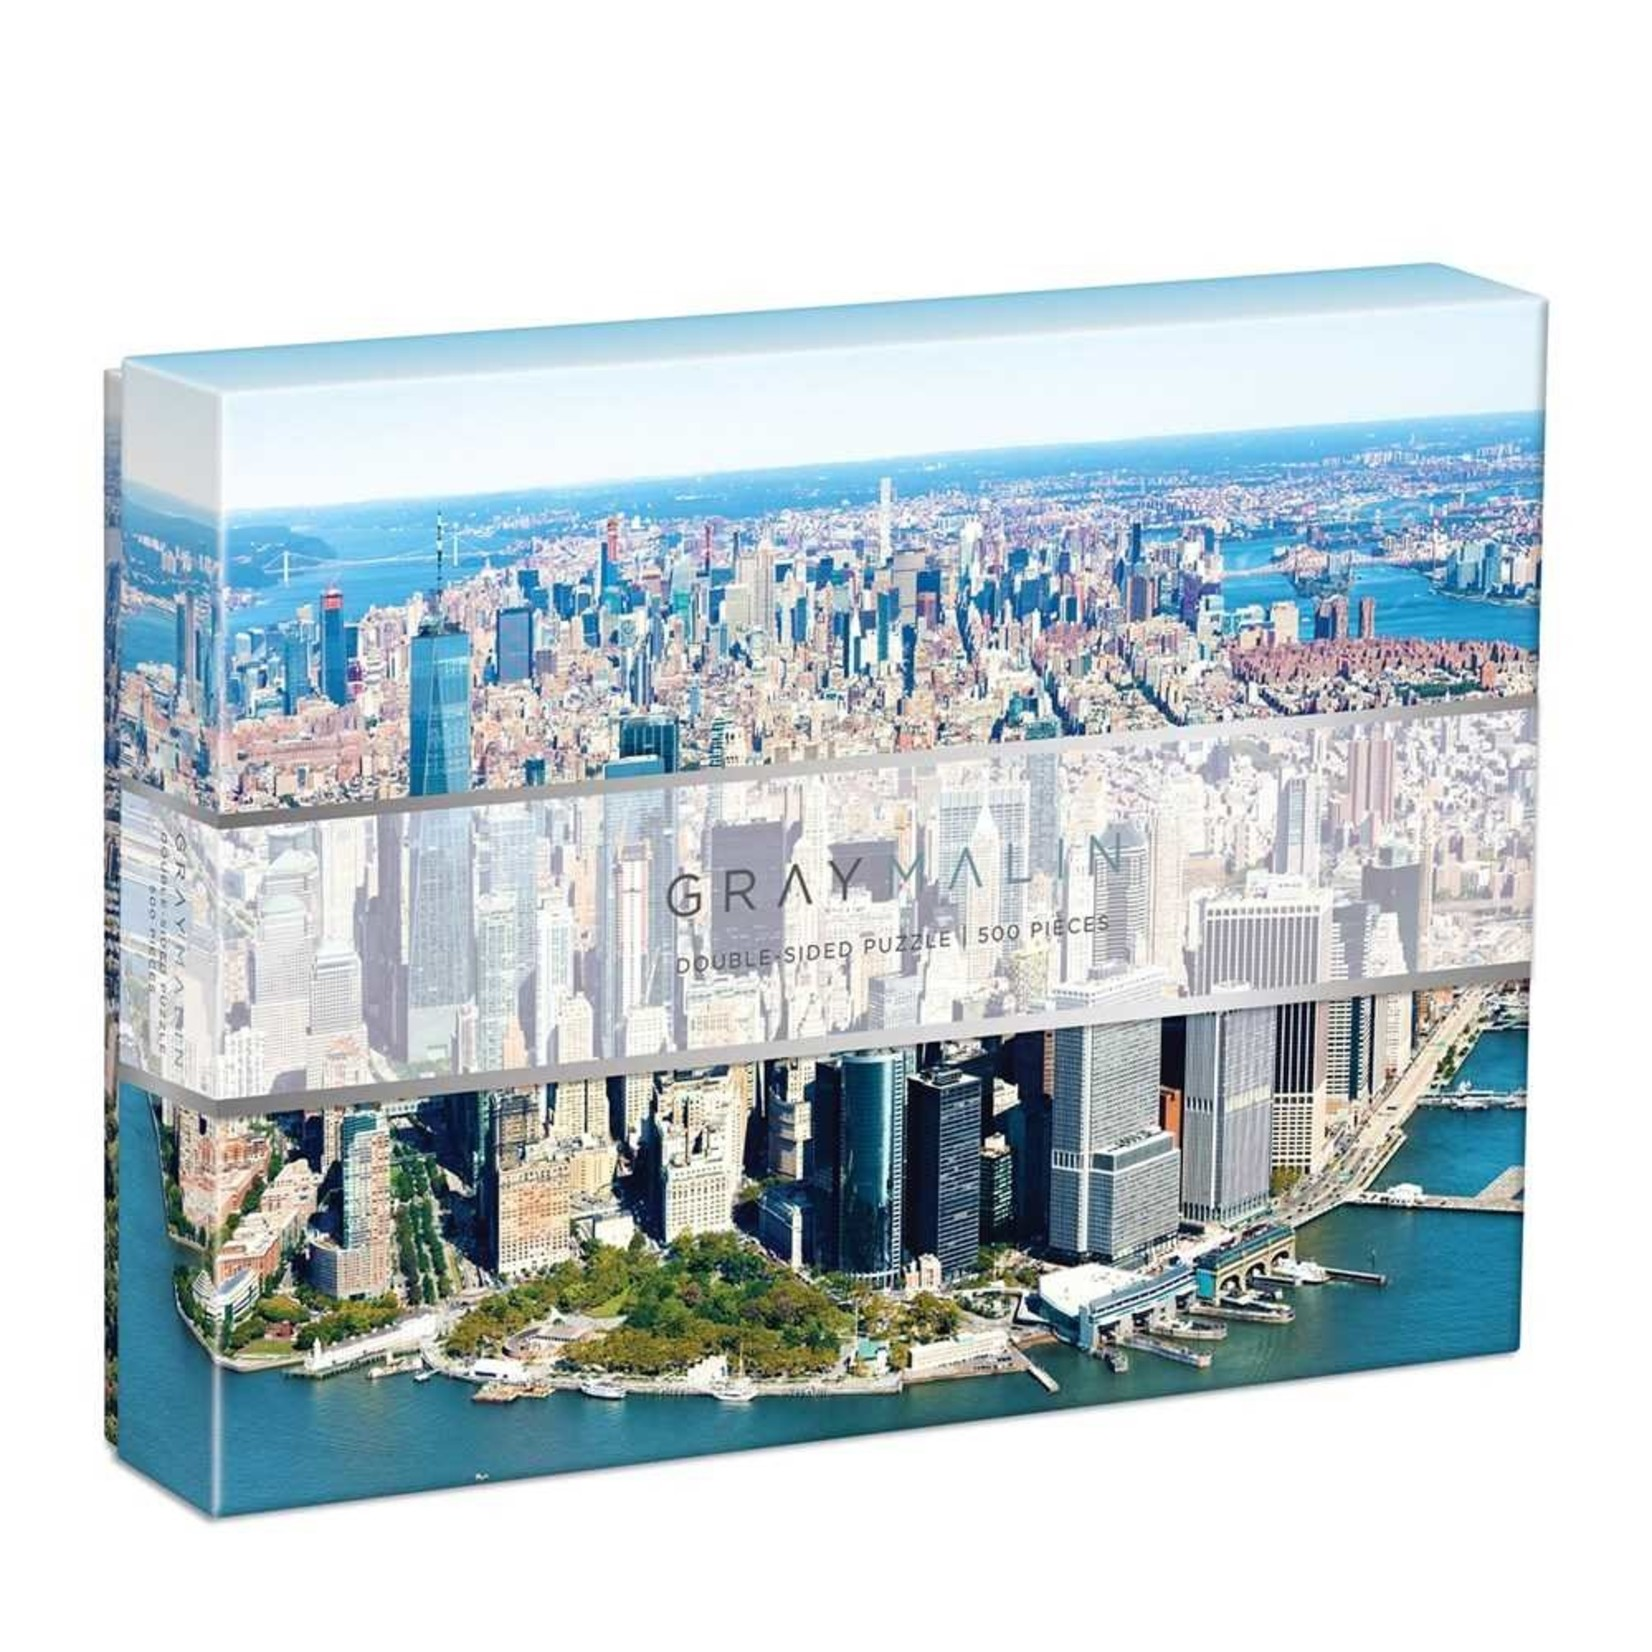 Galison New York City Malin DS 500pc